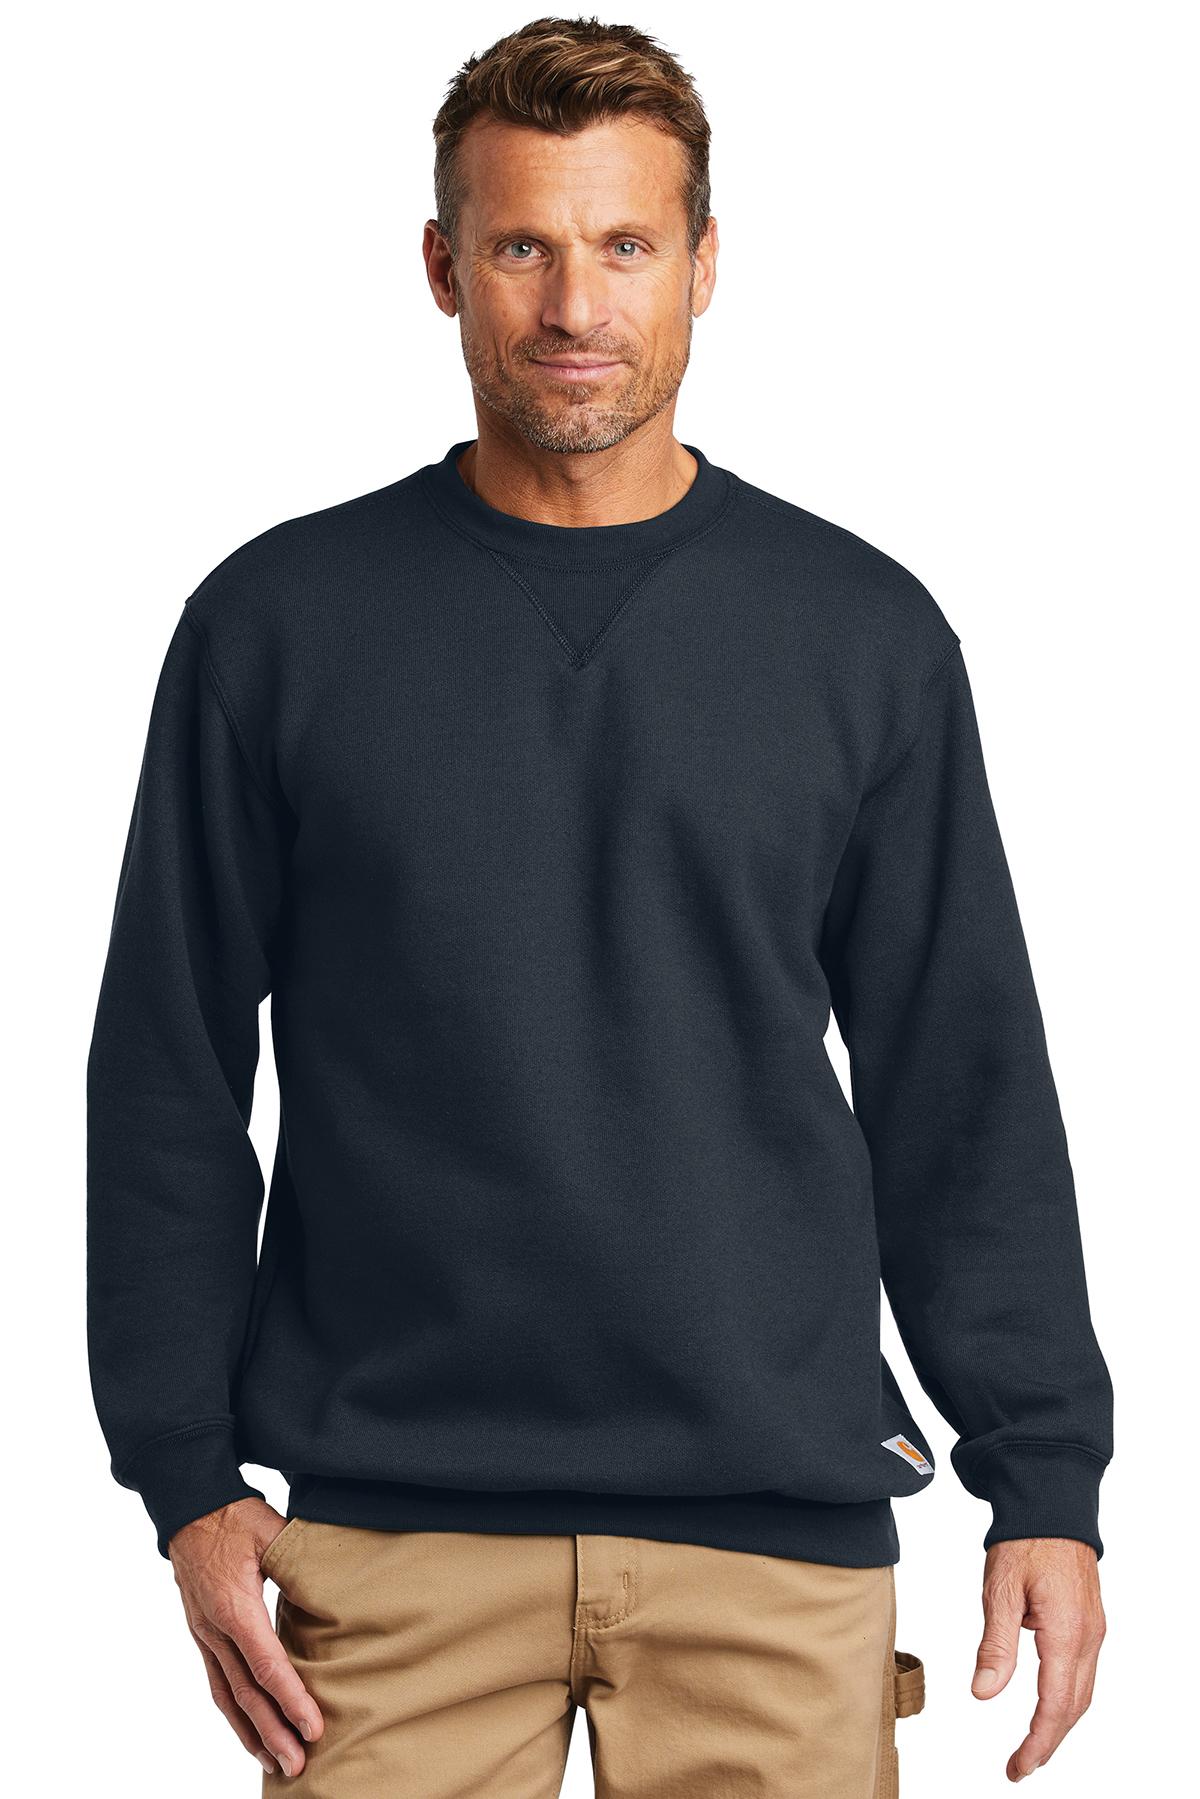 Carhartt CTK124 - Midweight Crewneck Sweatshirt